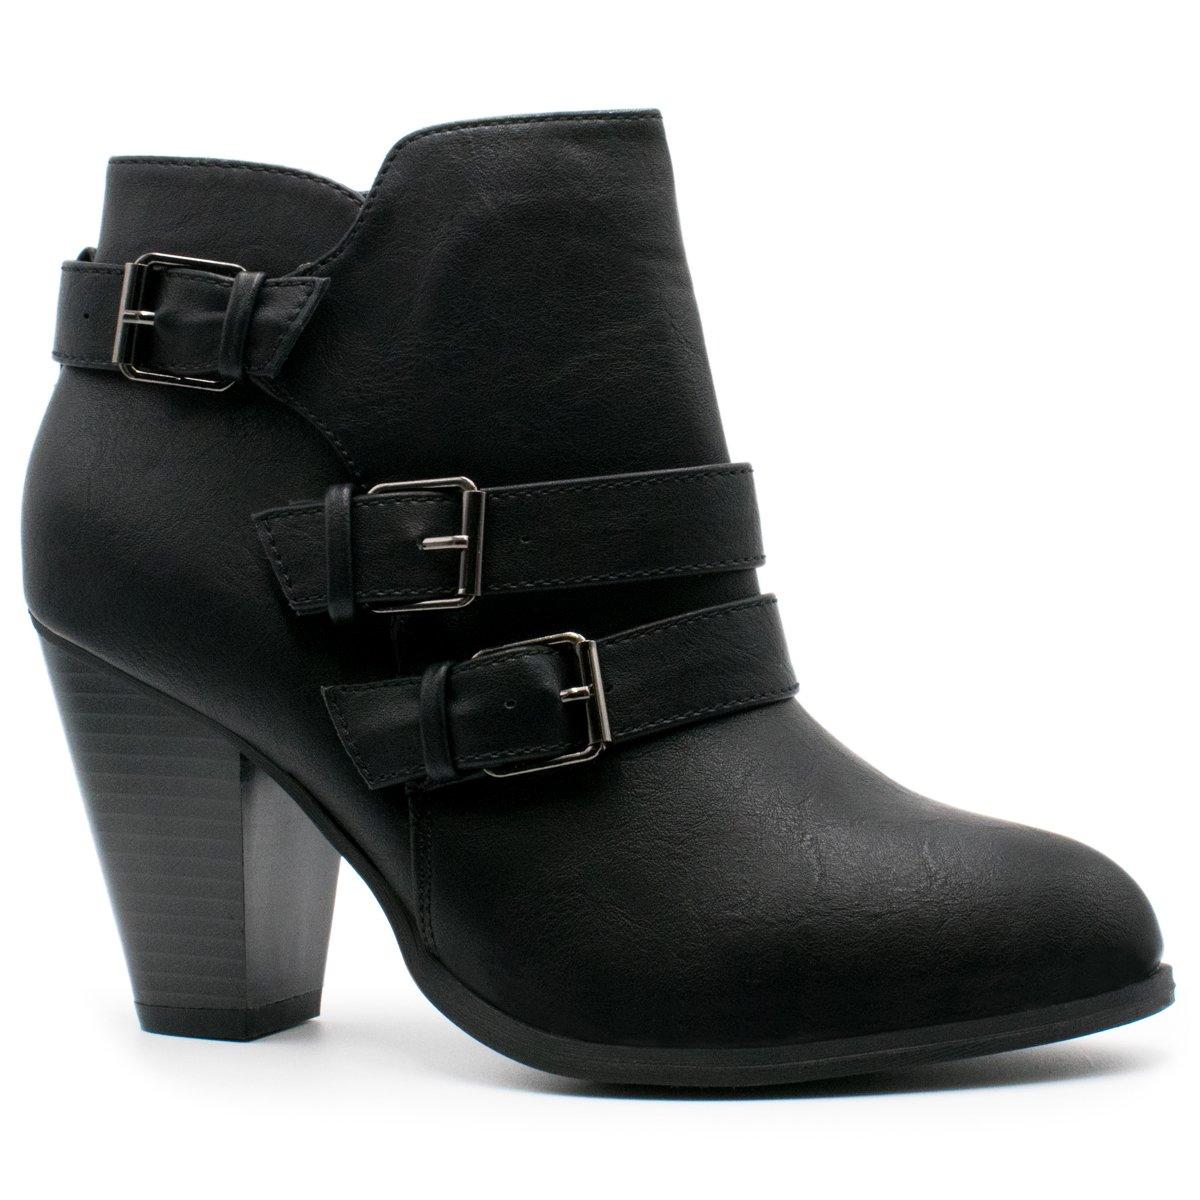 Premier Standard - Women's Buckle Strap Block Heel Ankle Booties, TPS Camila-64 v4 Black Size 8